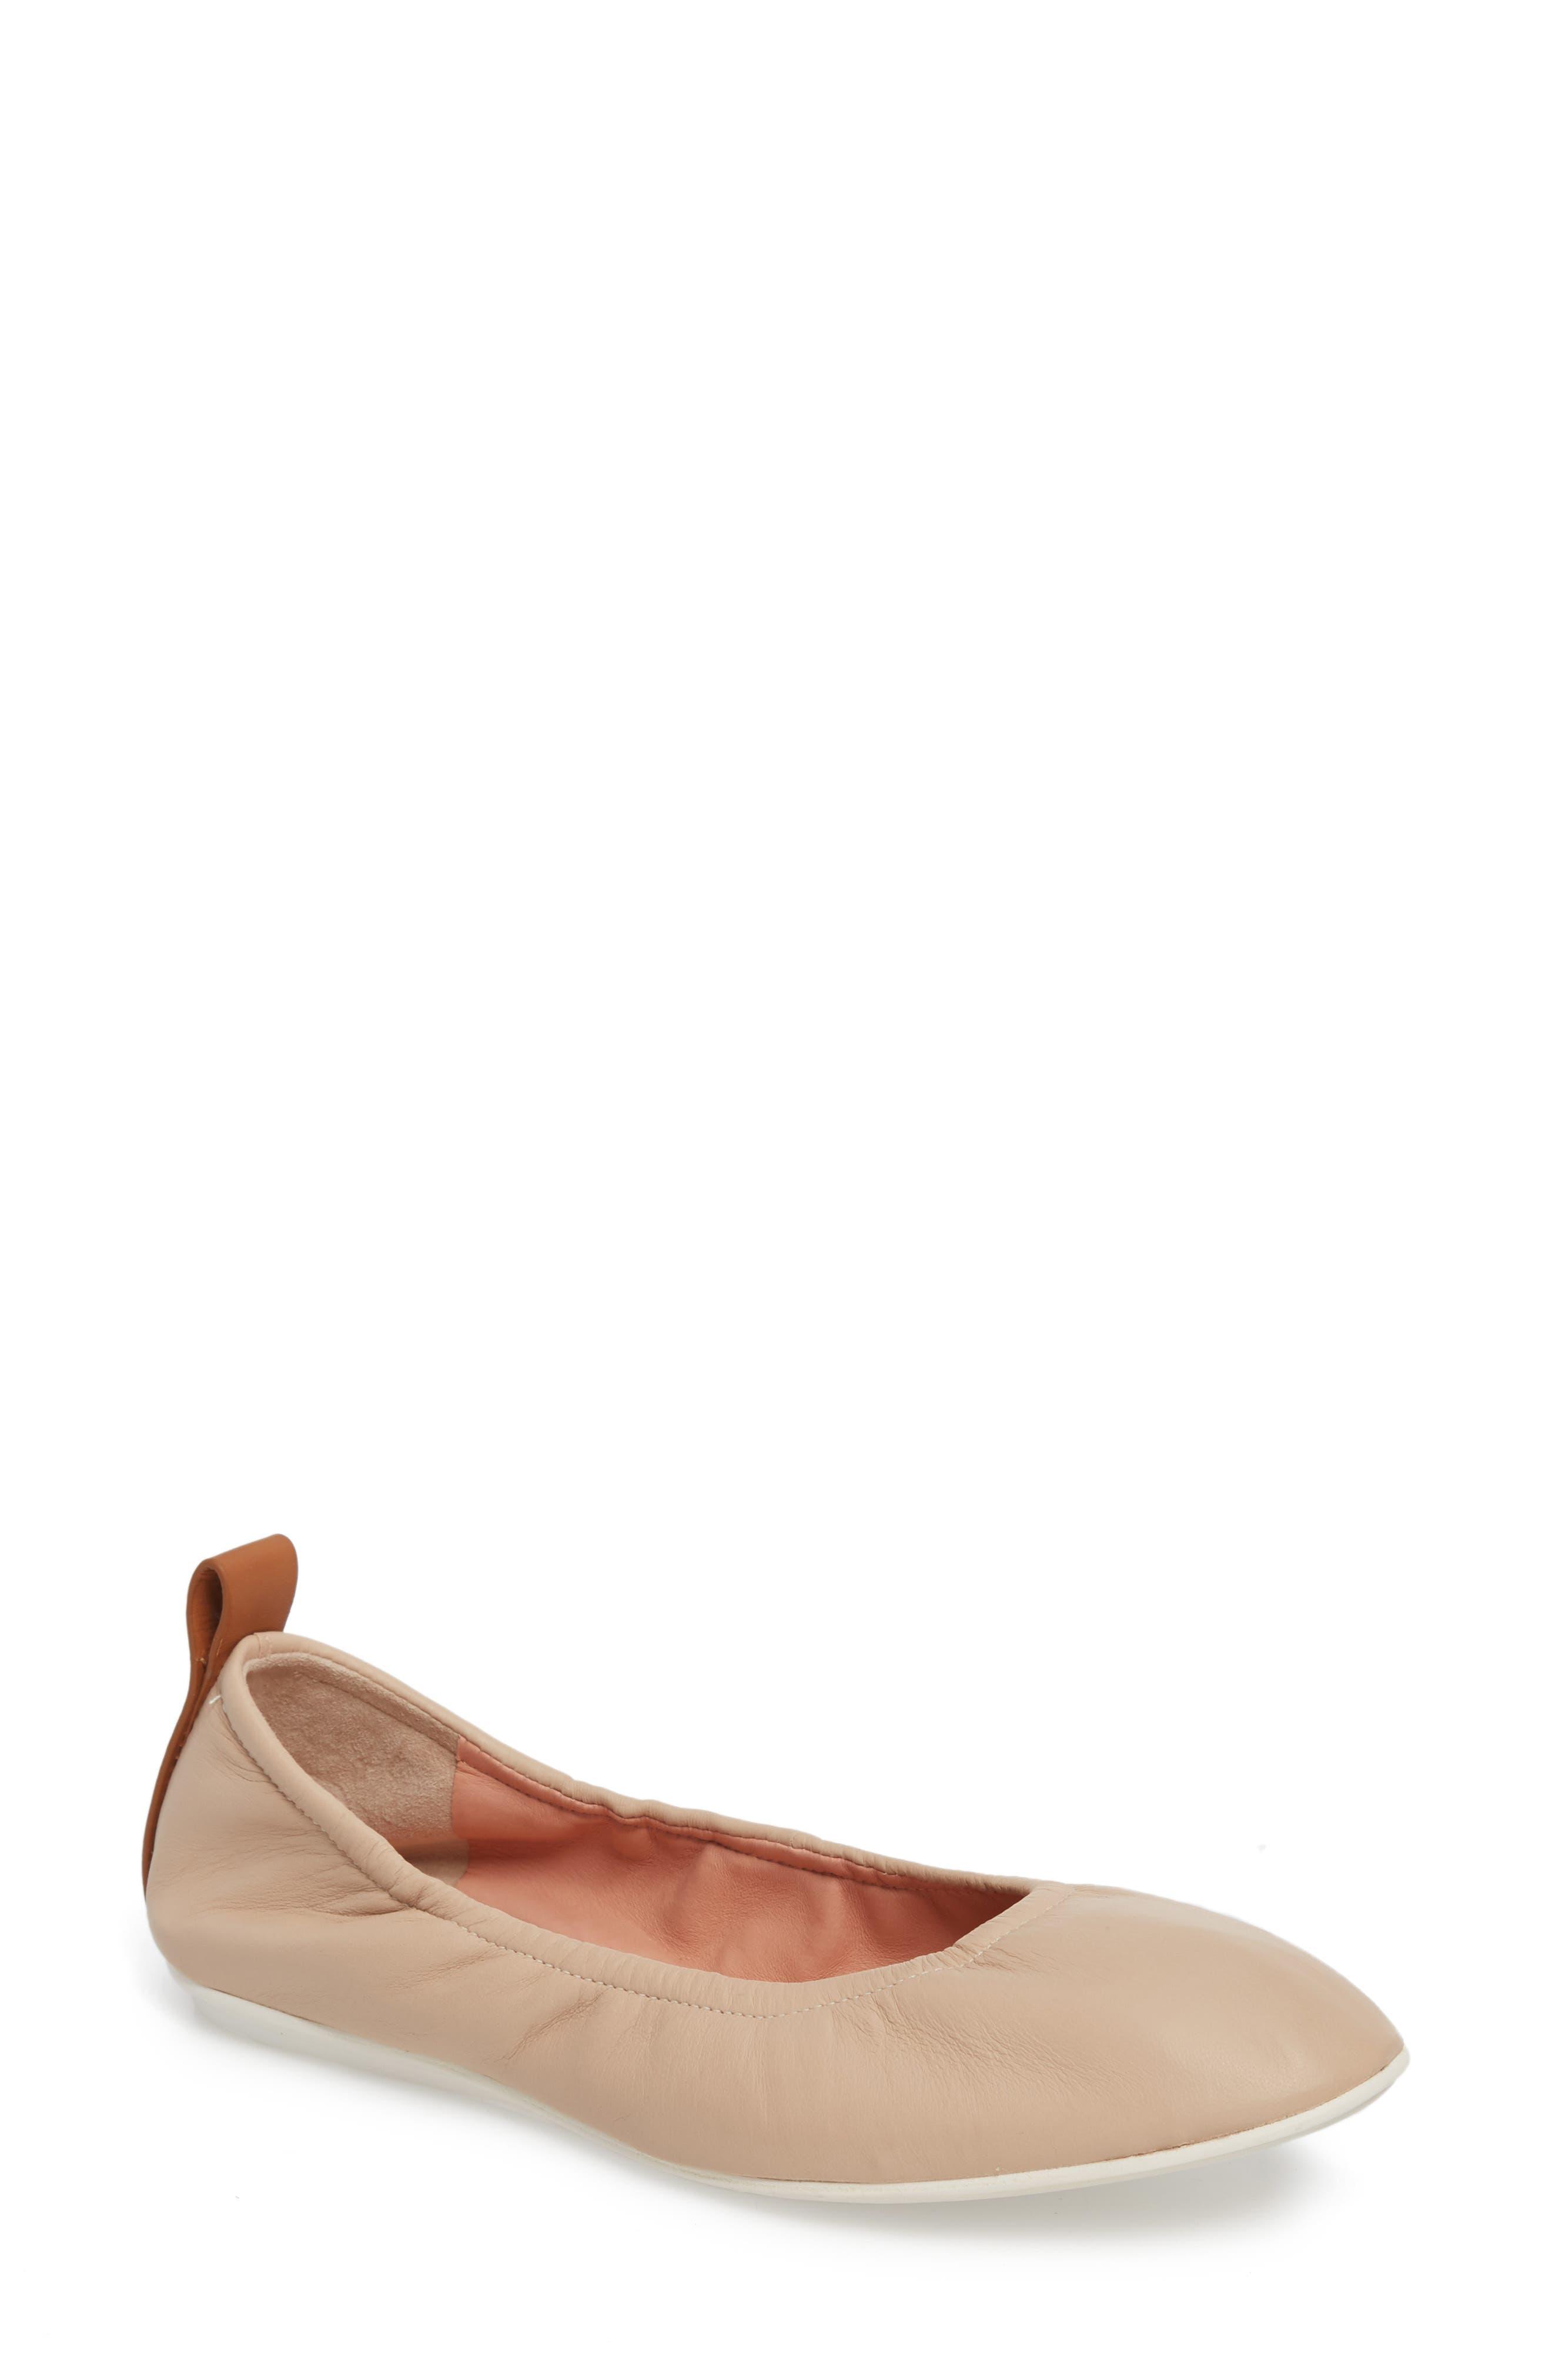 Carola Ballet Flat,                         Main,                         color, Nude